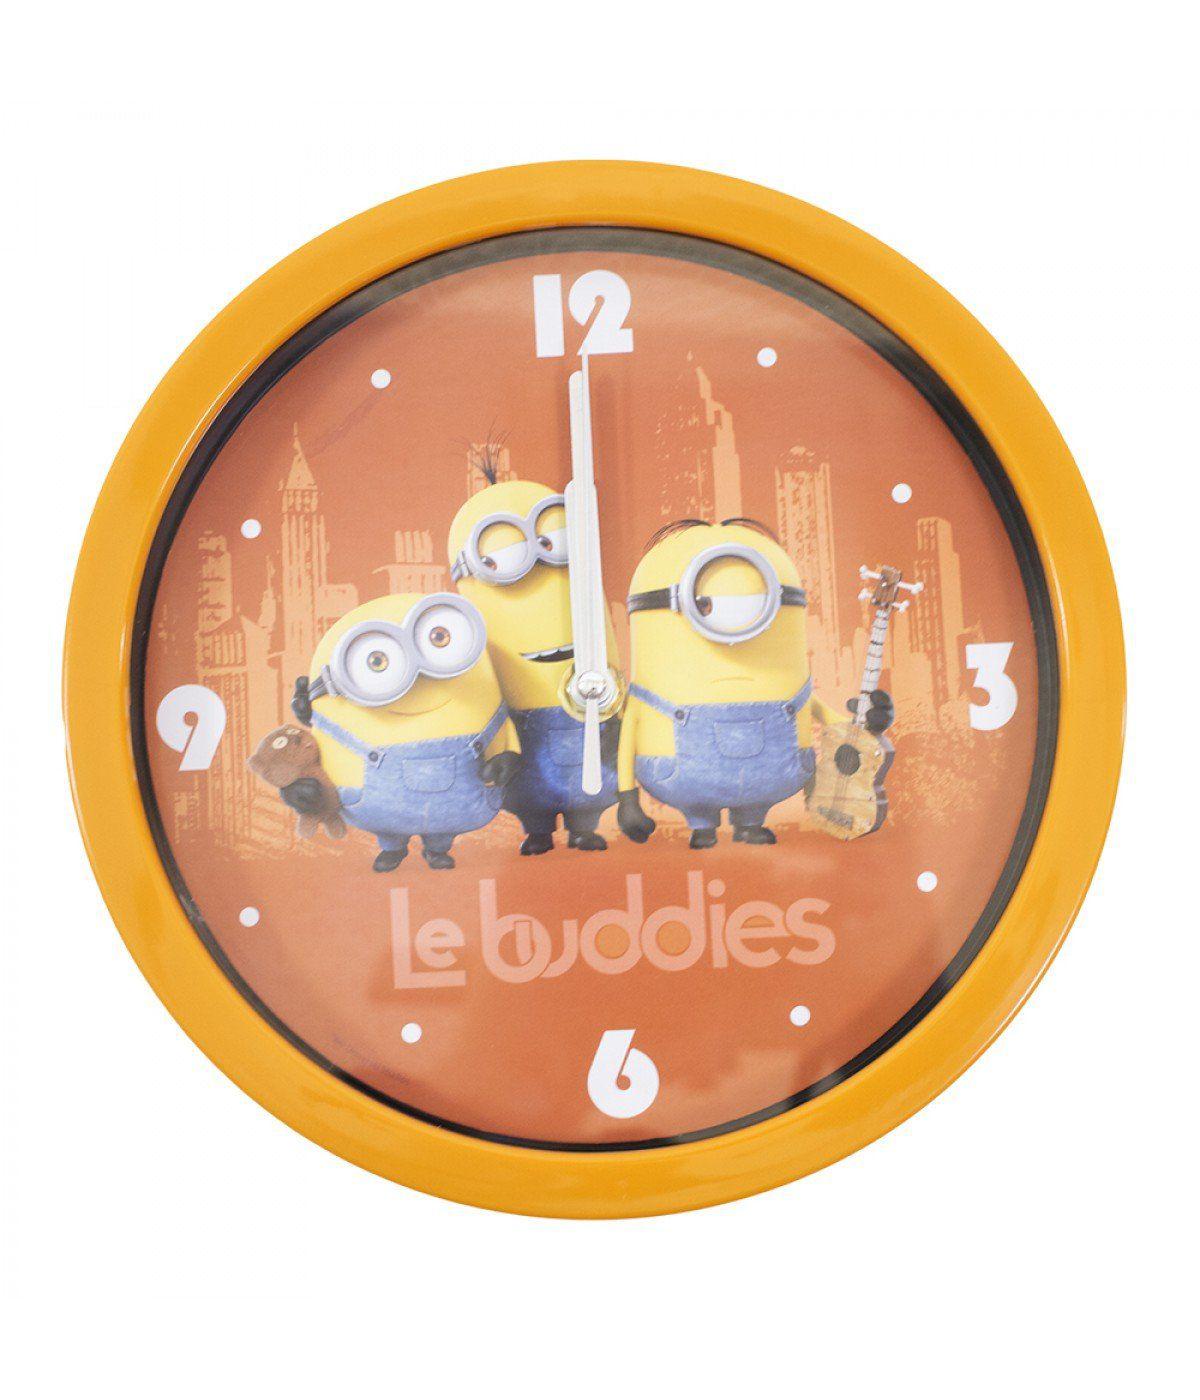 Relógio de Parede Minions (Le Buddies): Meu Malvado Favorito